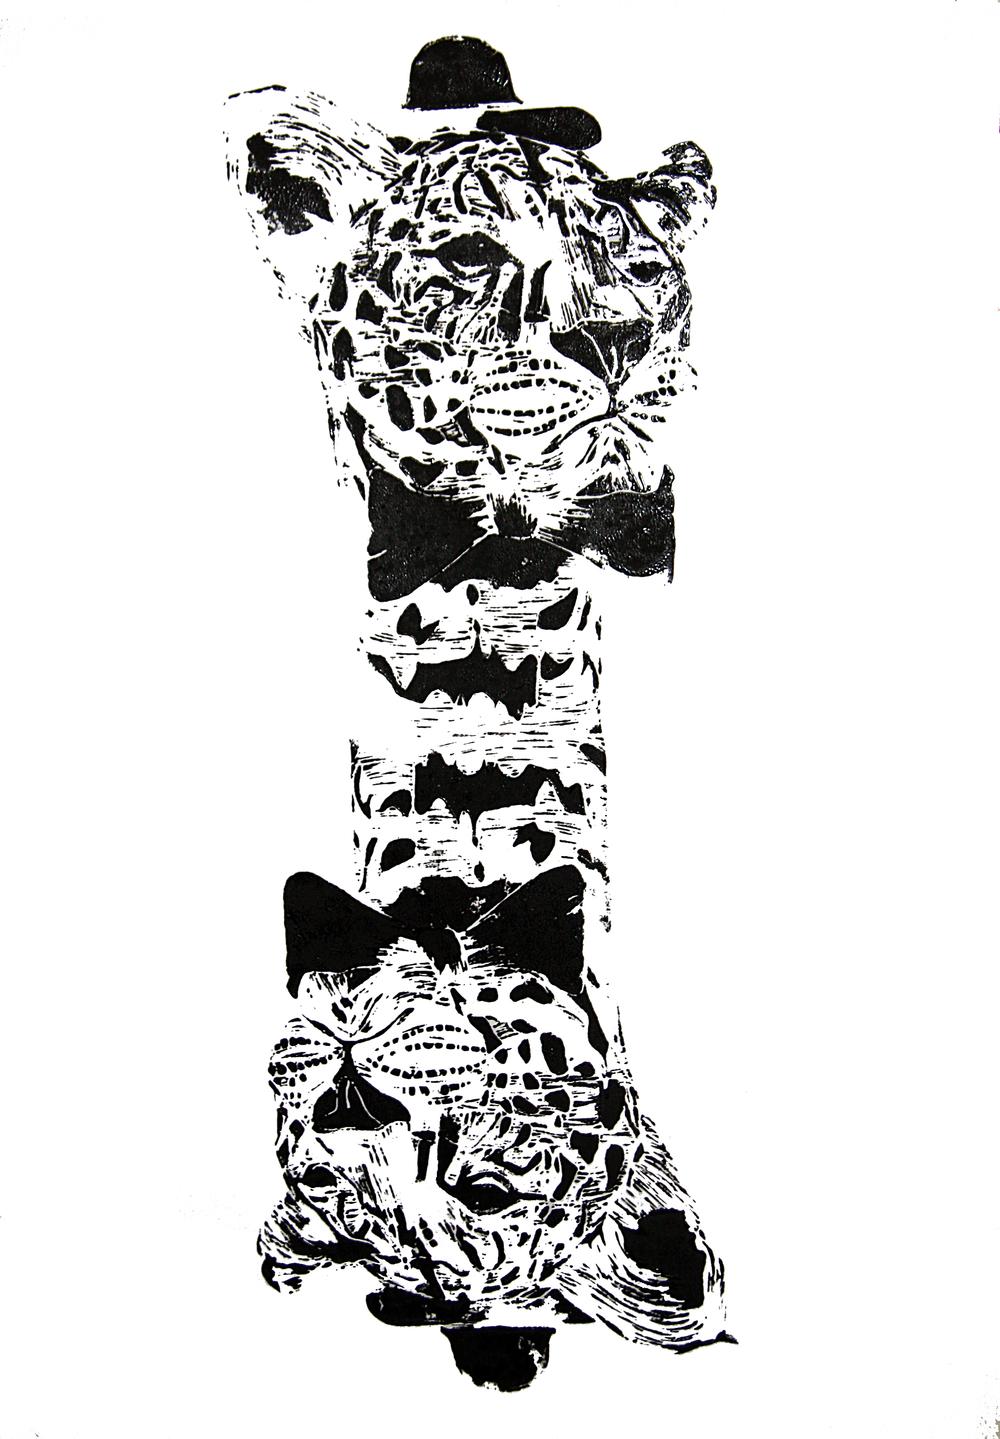 'Mr. Leopard- two heads' (black), on paper, 42cm x 59.4cm, 2016